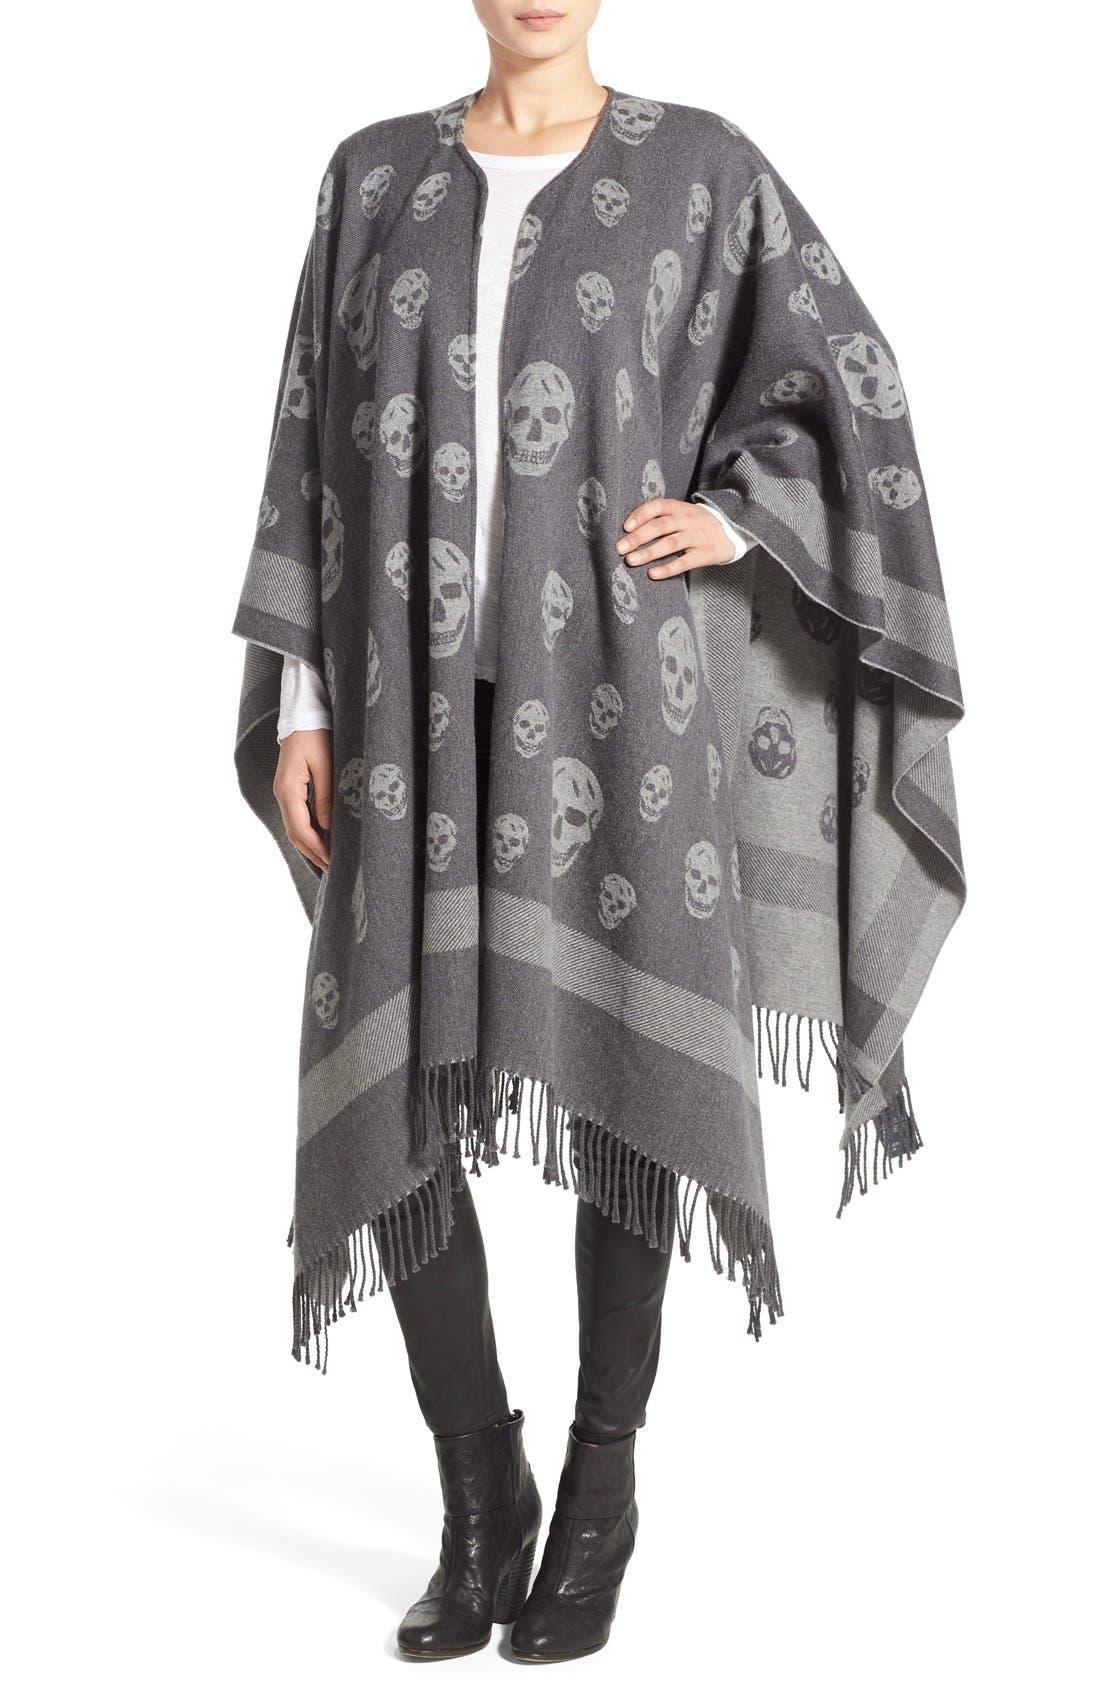 Alexander McQueen 'Big Skull' Wool & Cashmere Jacquard Poncho